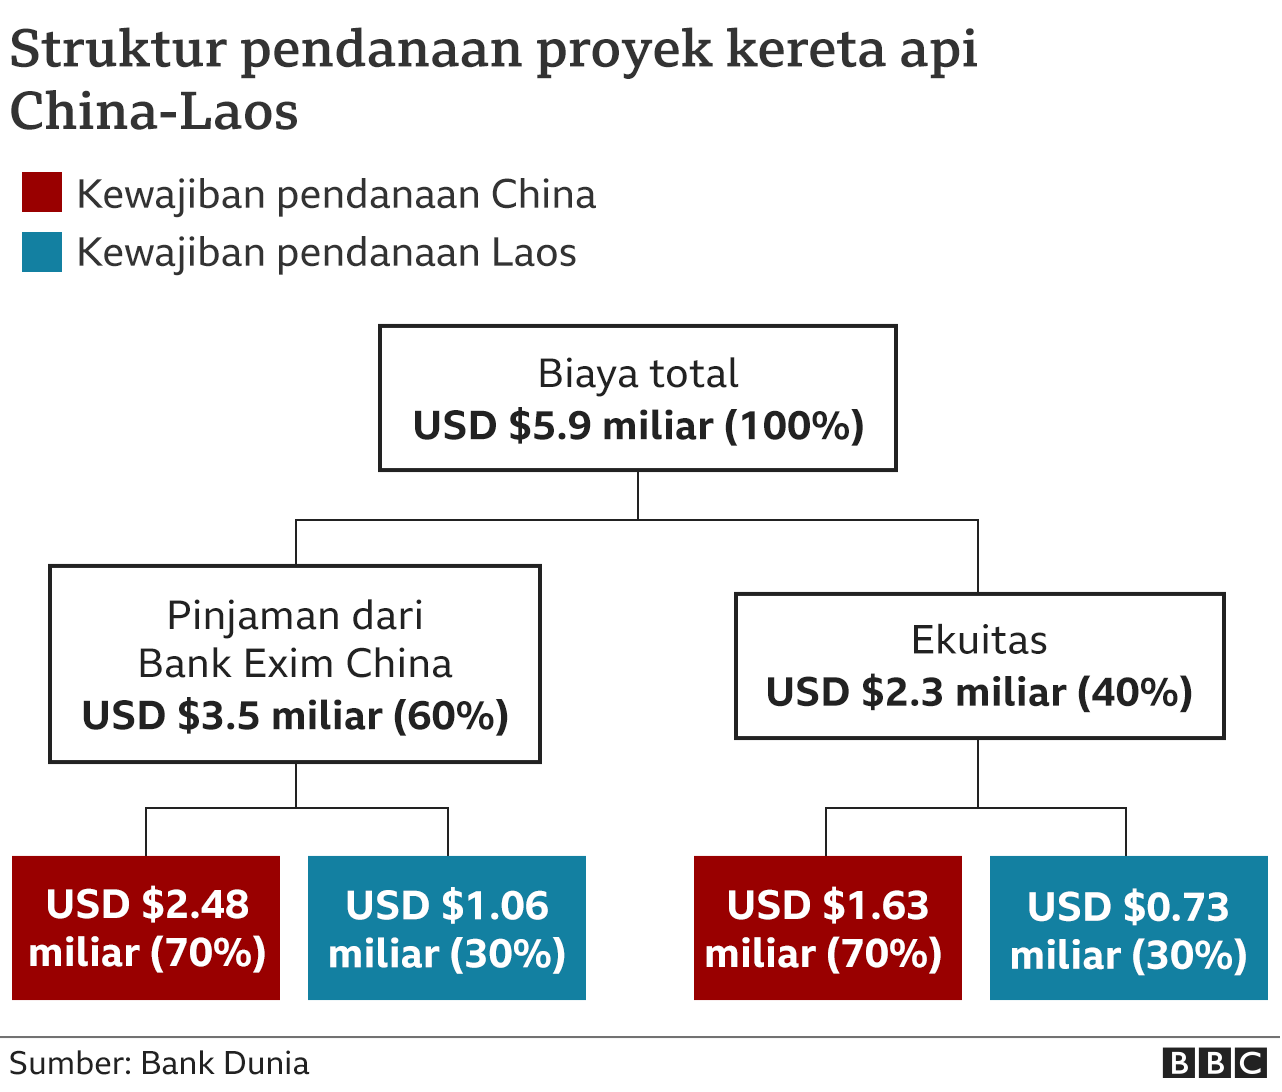 Struktur pendanaan proyek kereta api cepat China-Laos